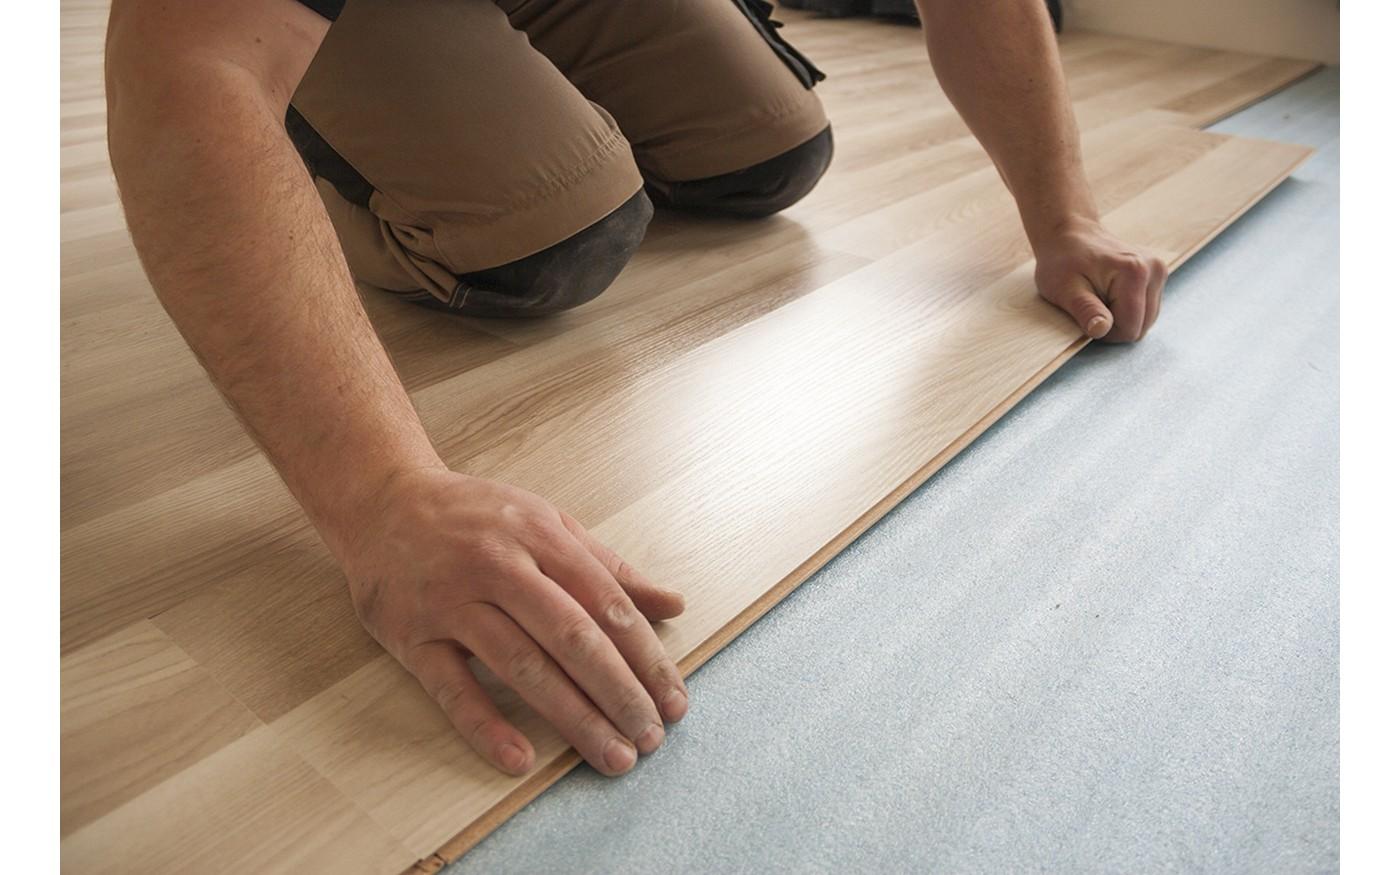 Gluing wood panels